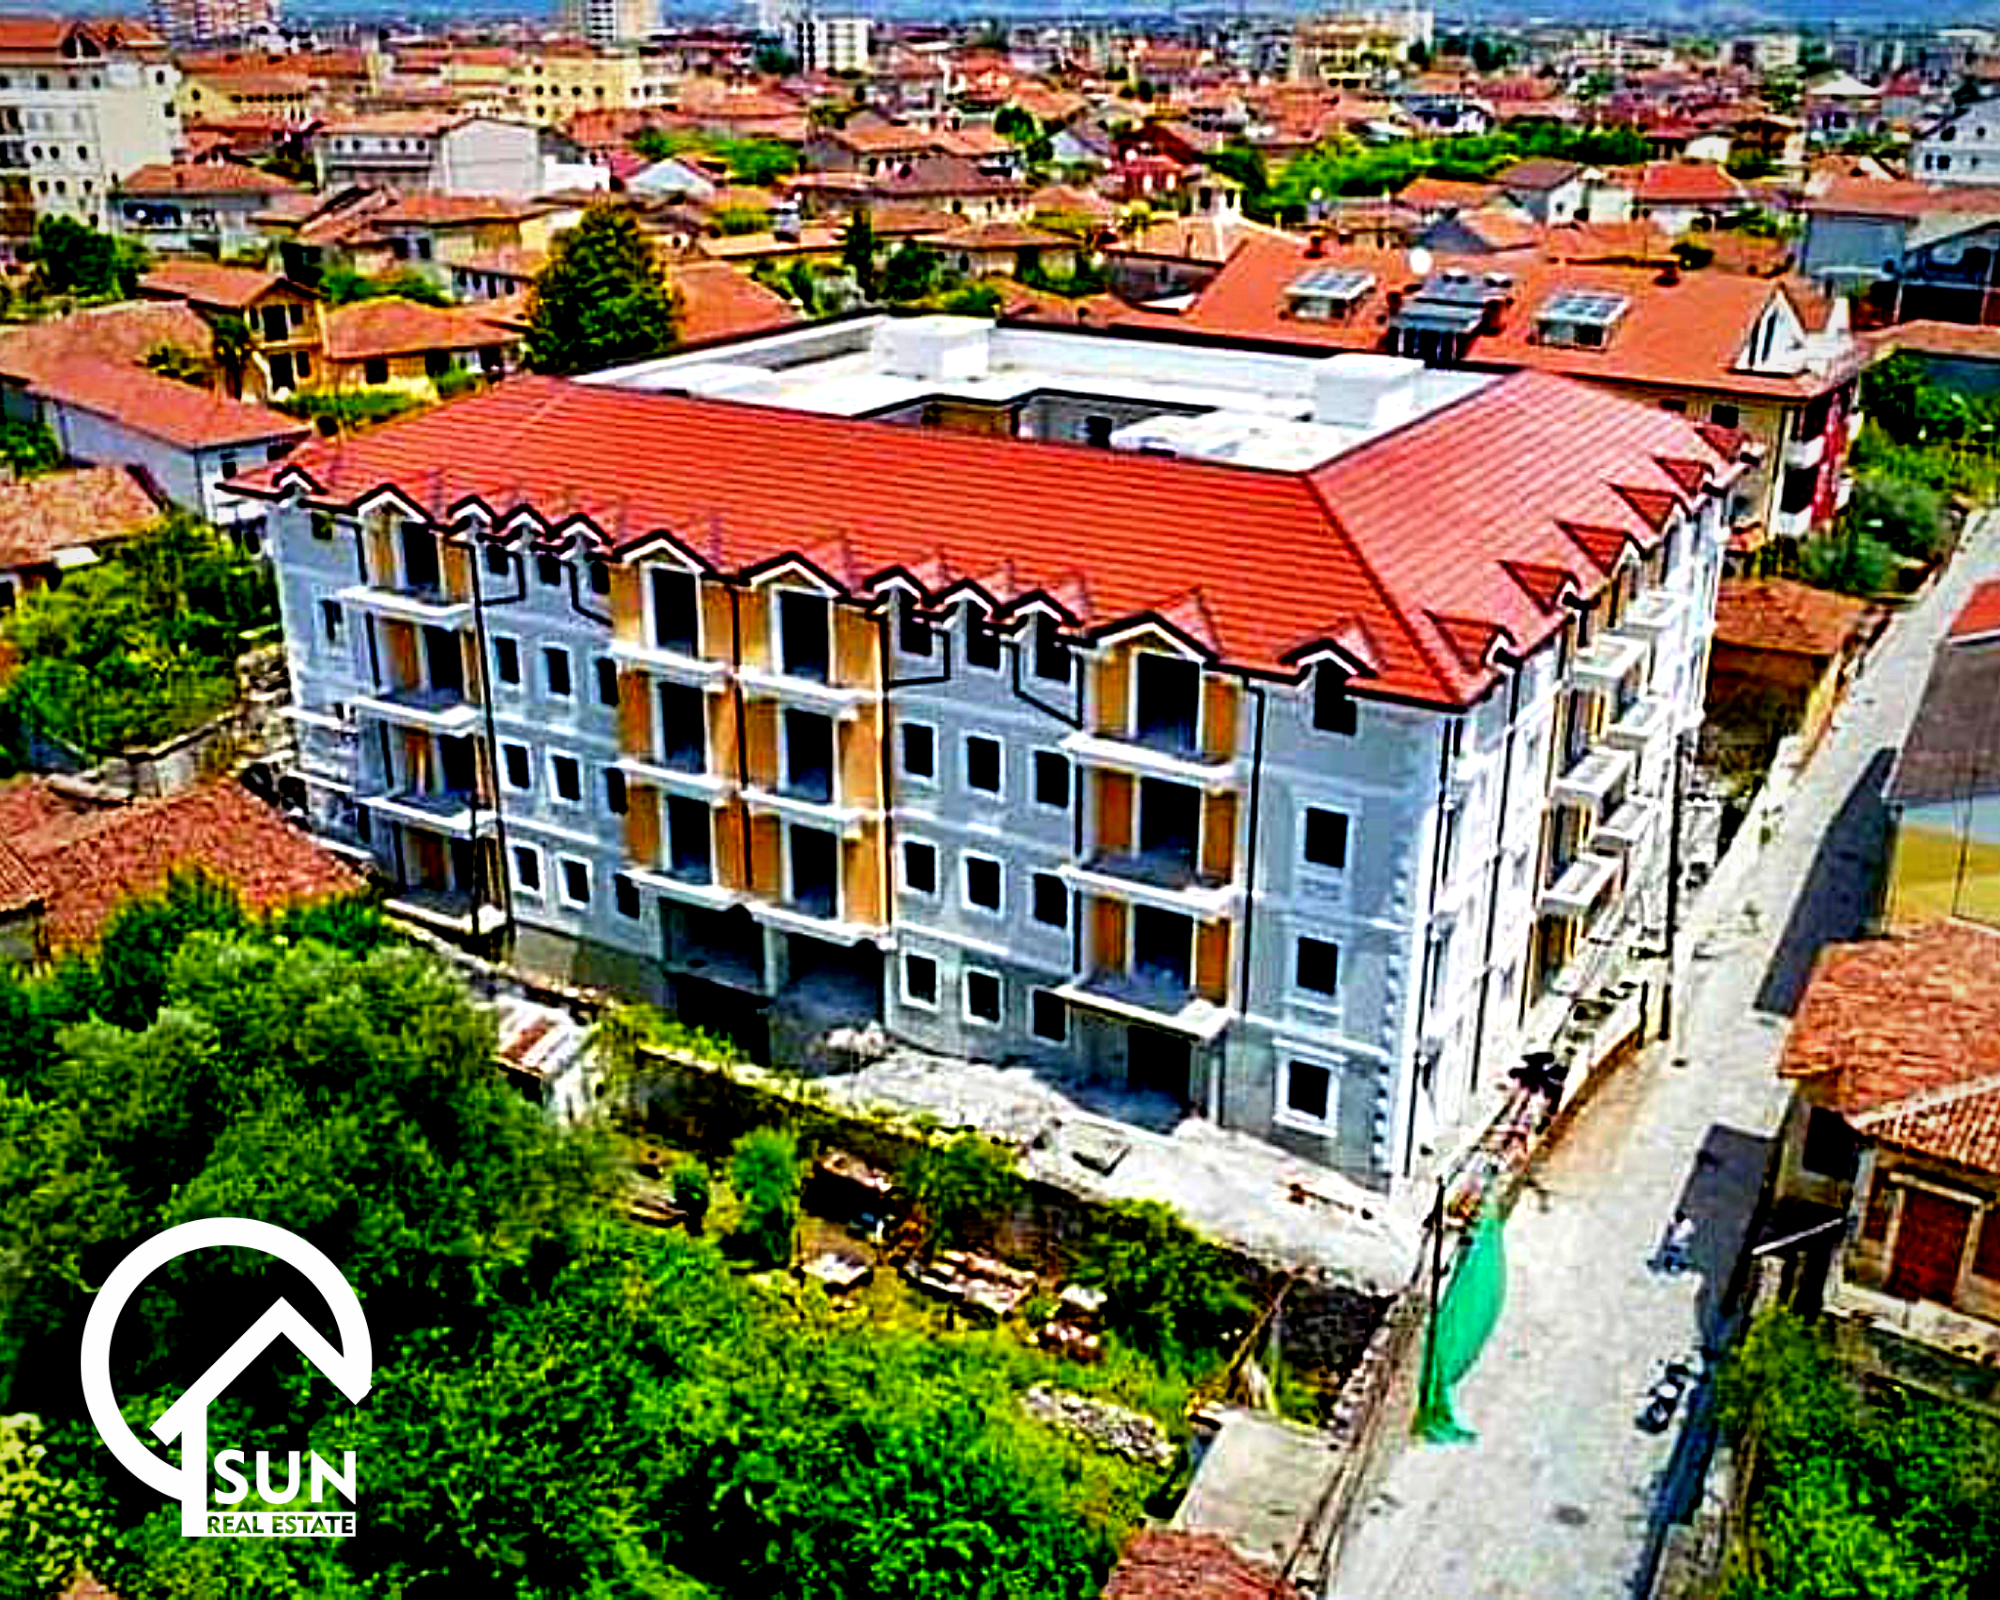 Apartament 2+1 per shitje, Shkoder